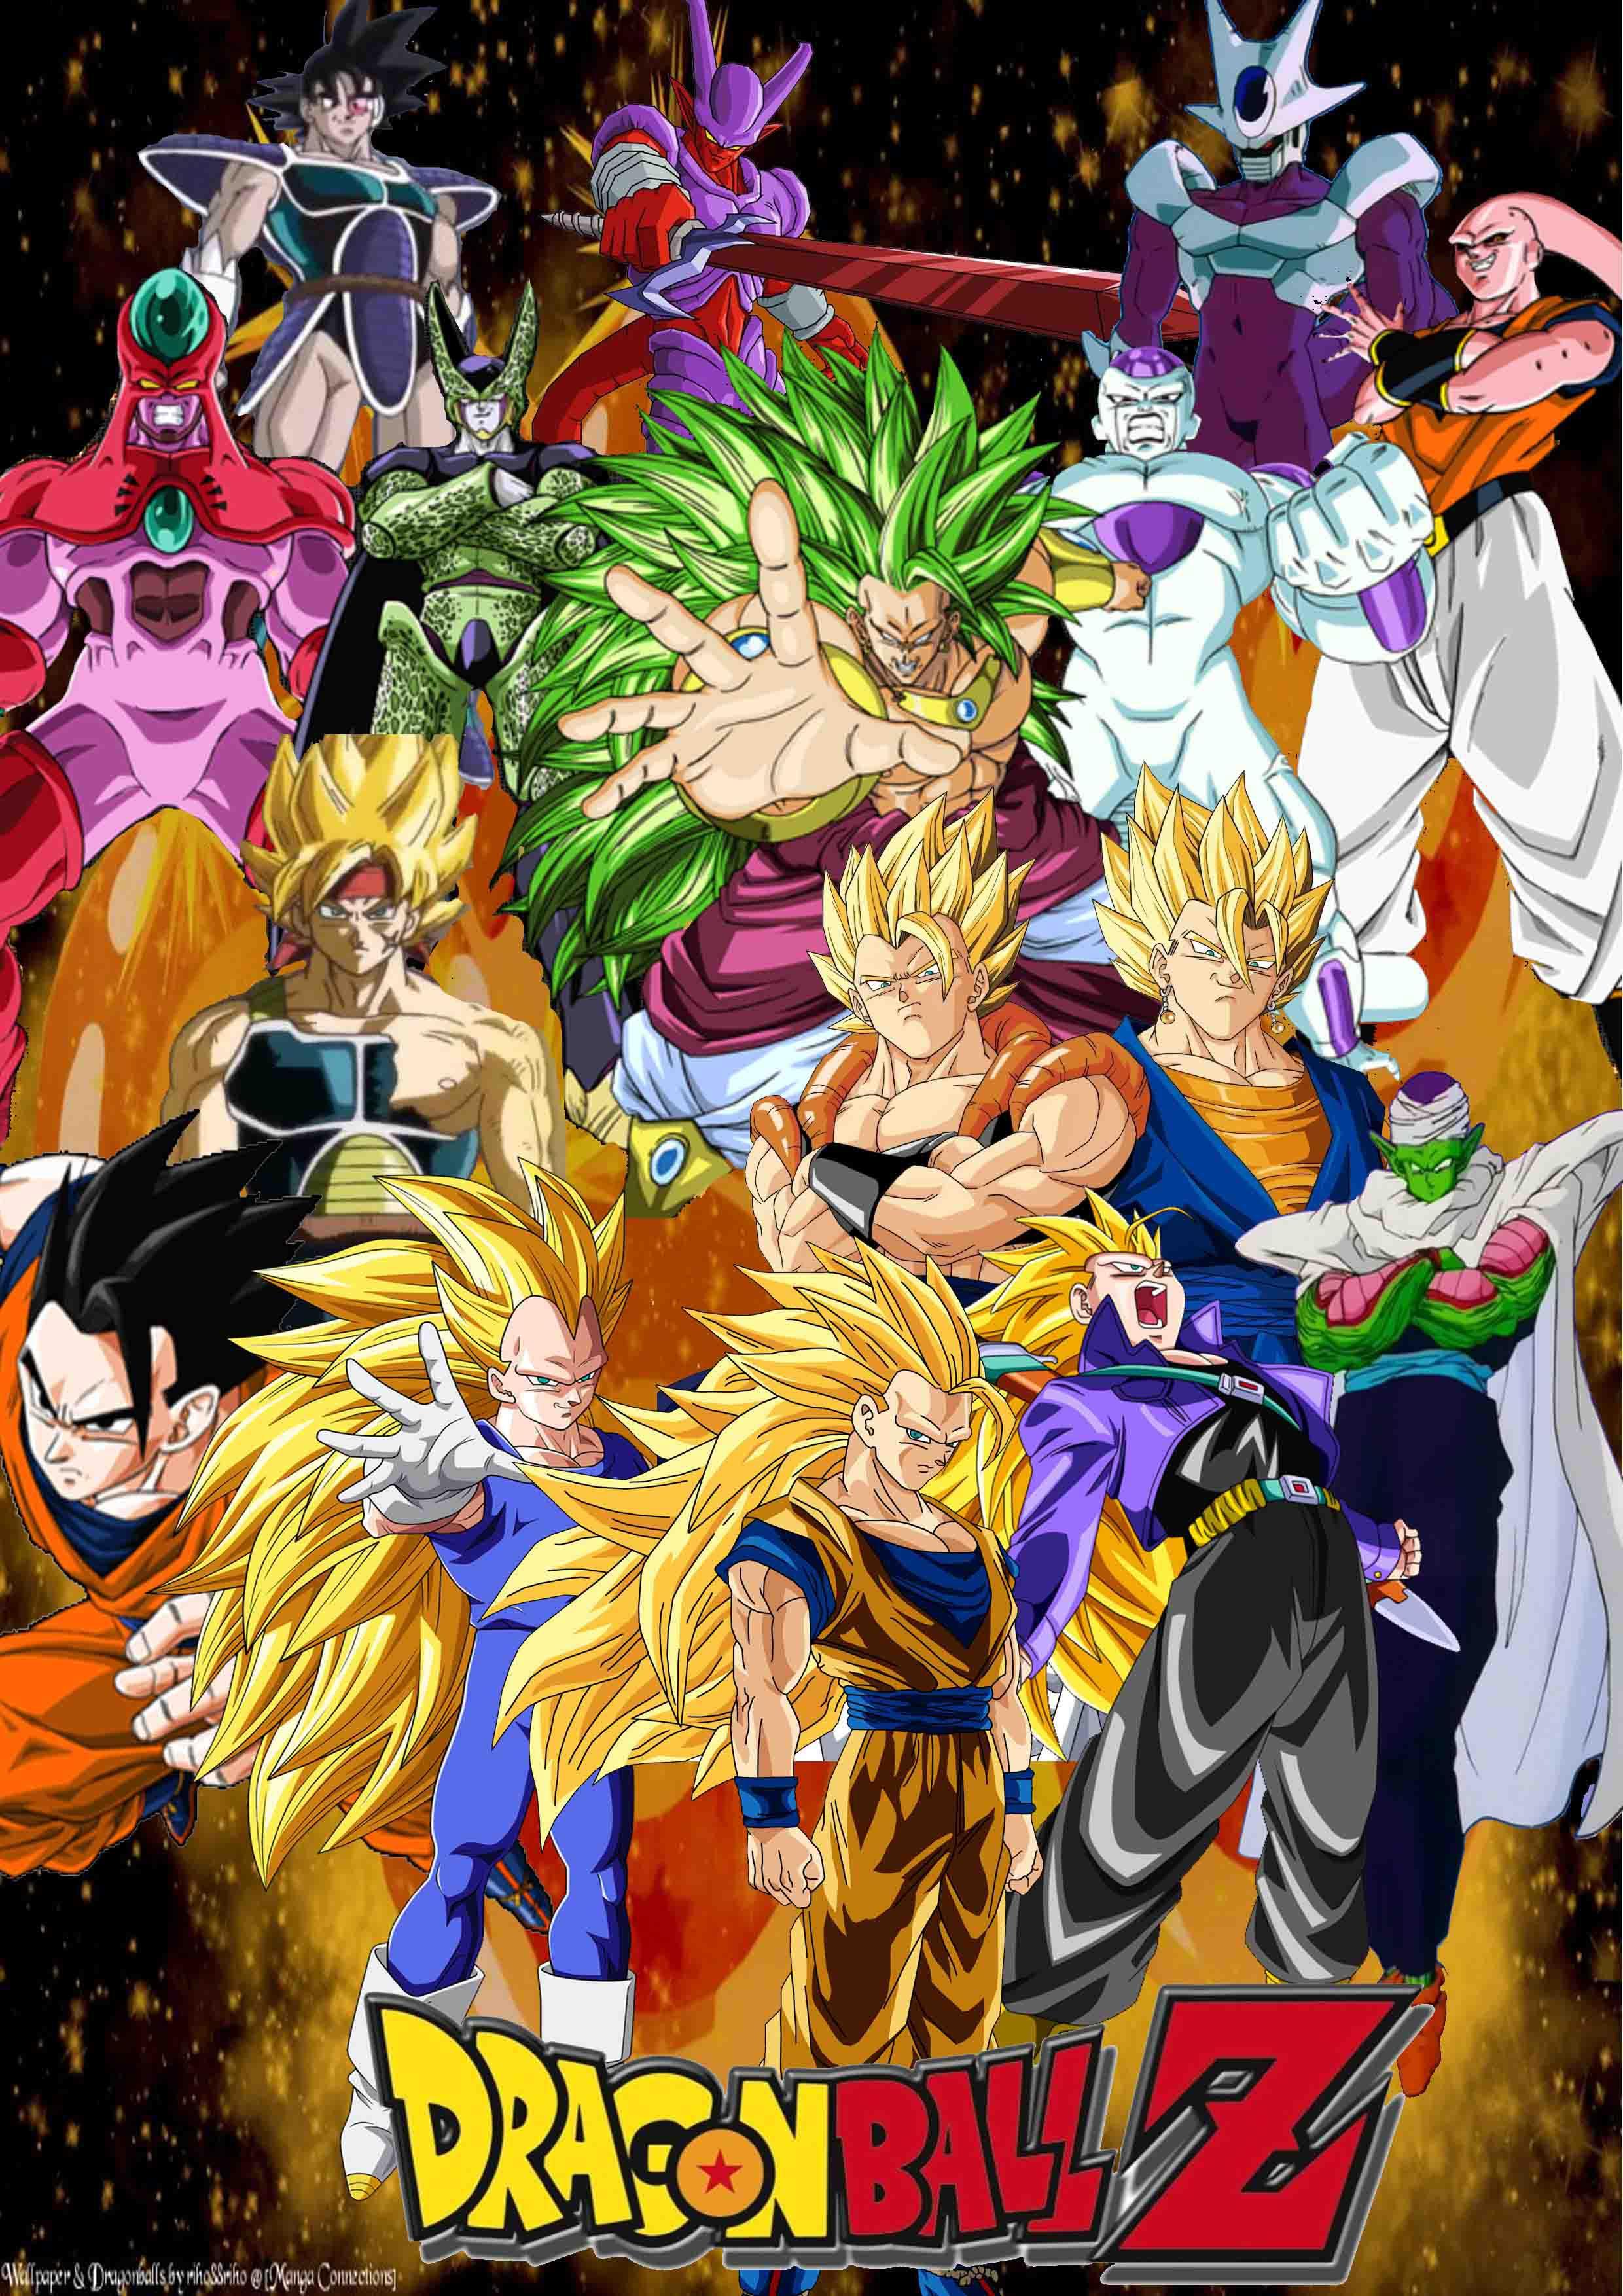 Dragon Ball Z Silk Poster 29 From Wonderfulmaker